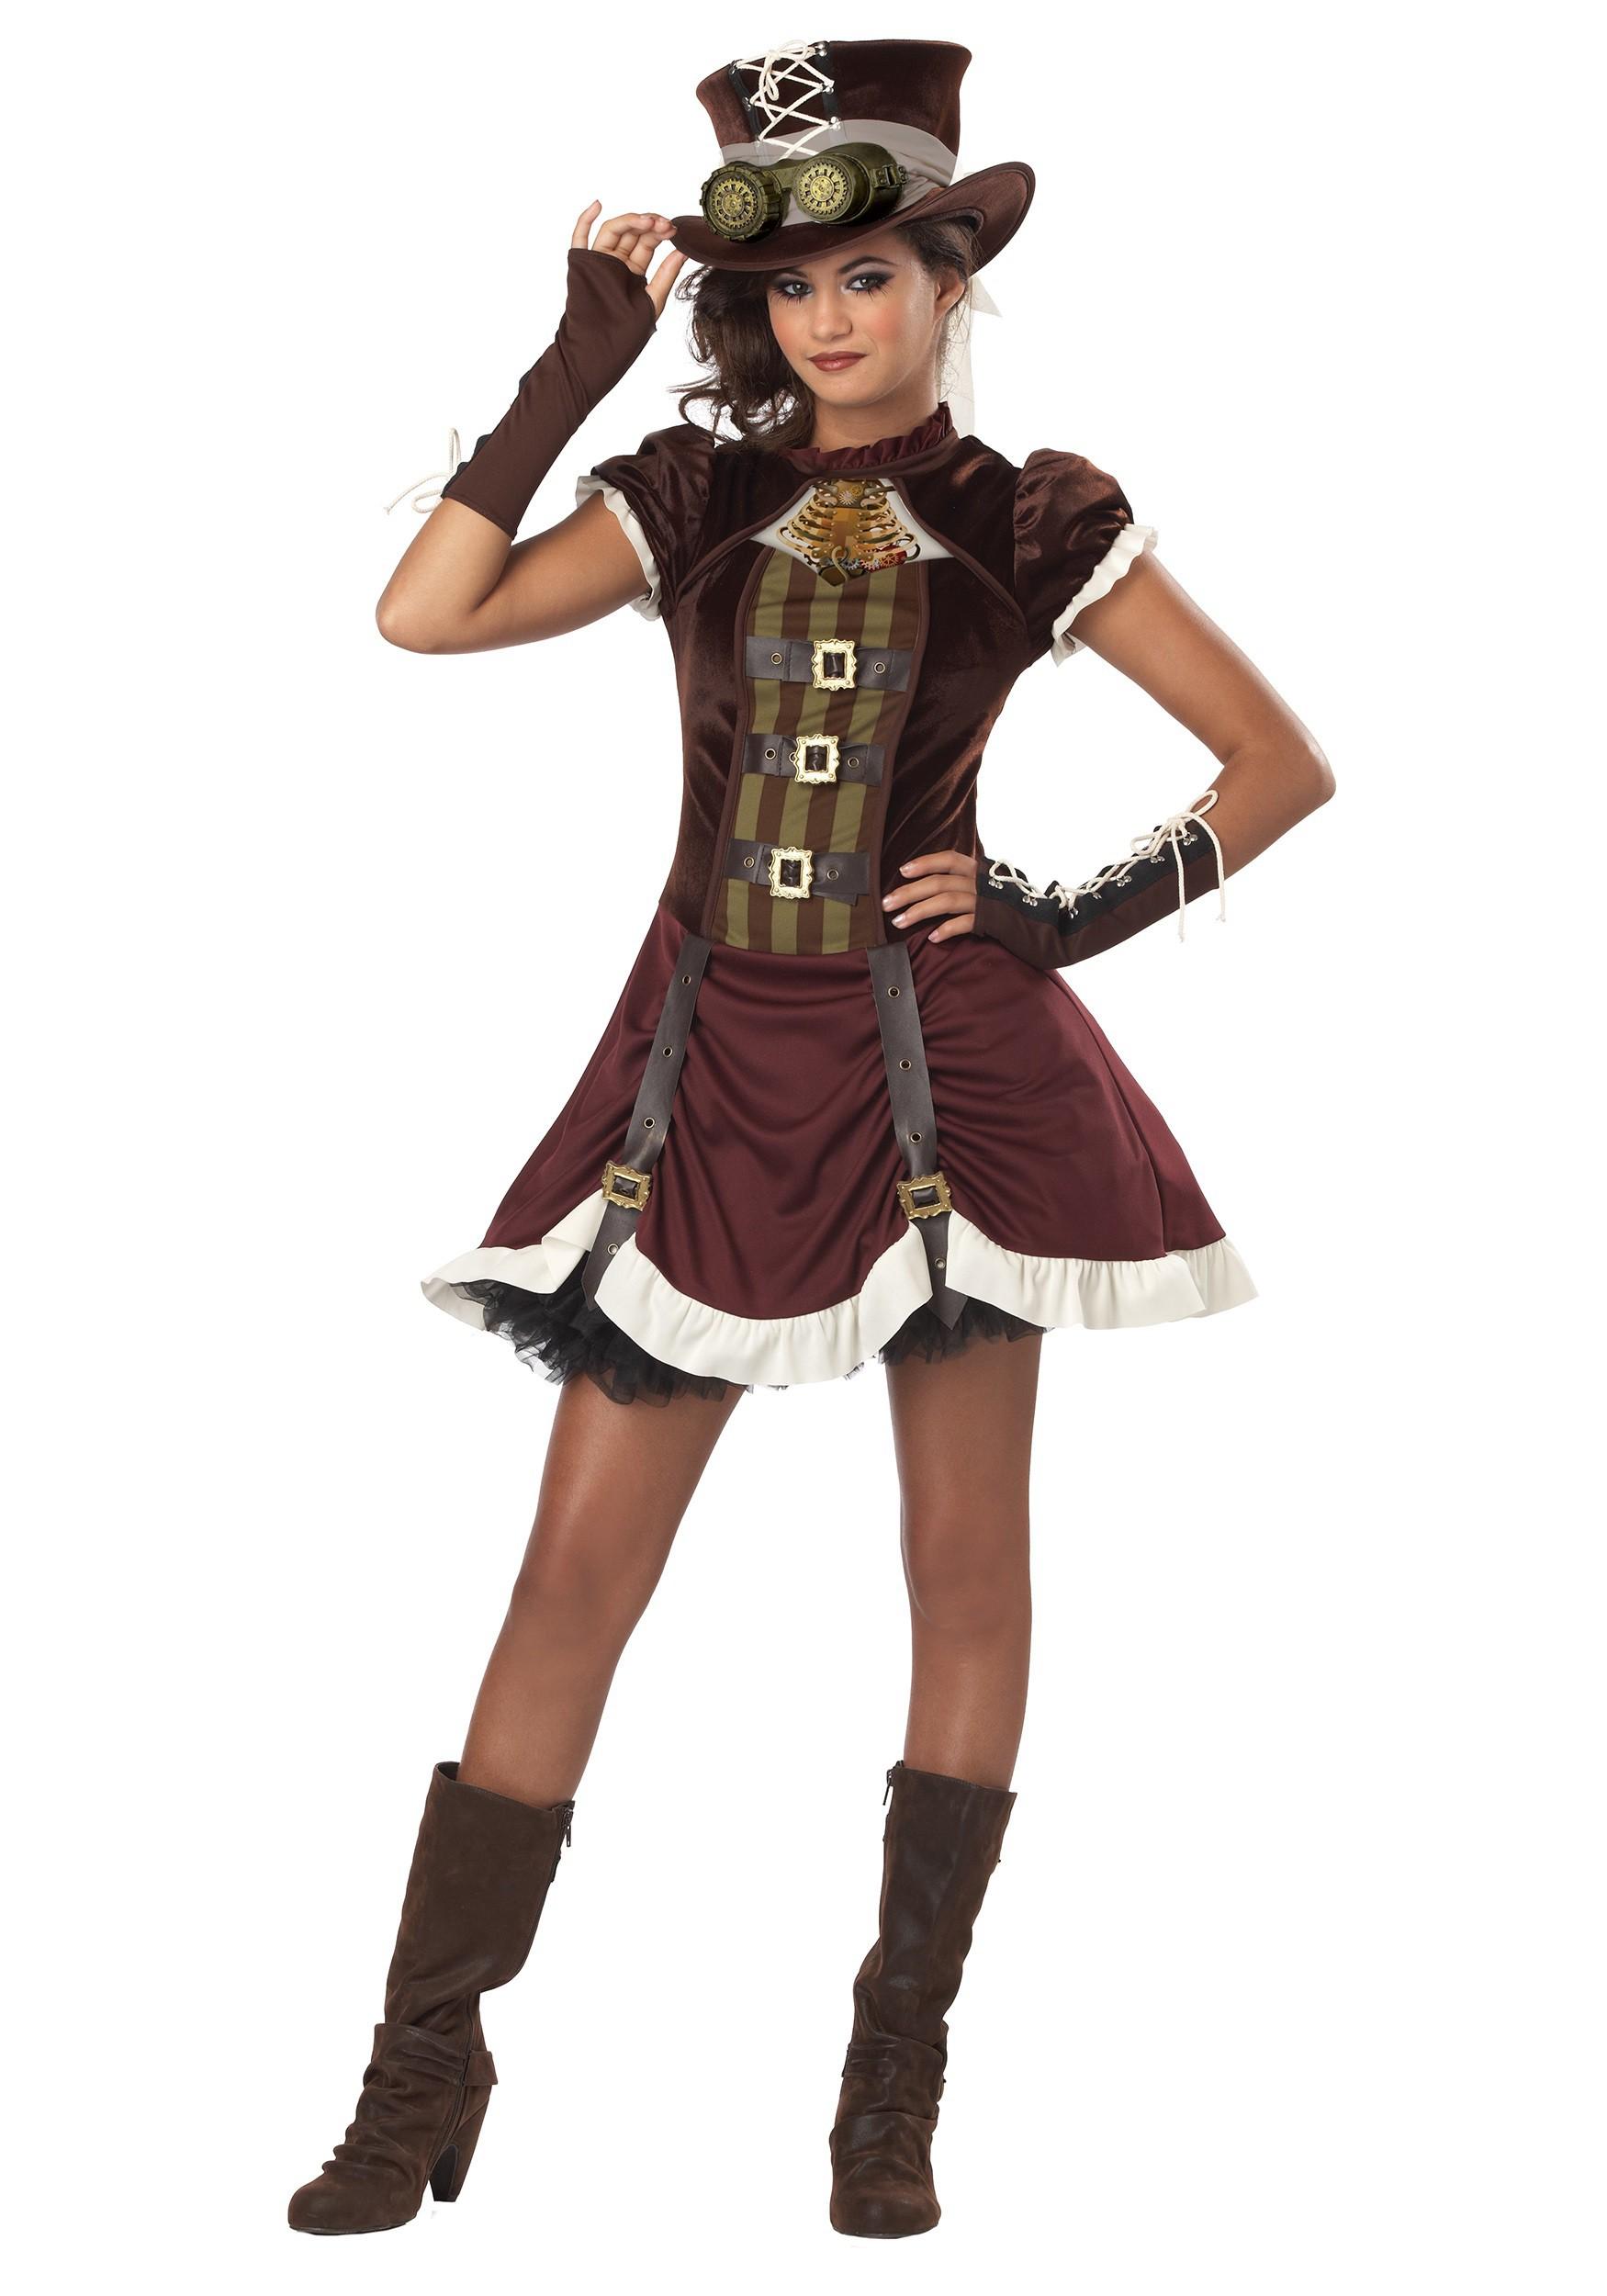 Tween Steampunk Costume for Girls | Unique Halloween Costumes